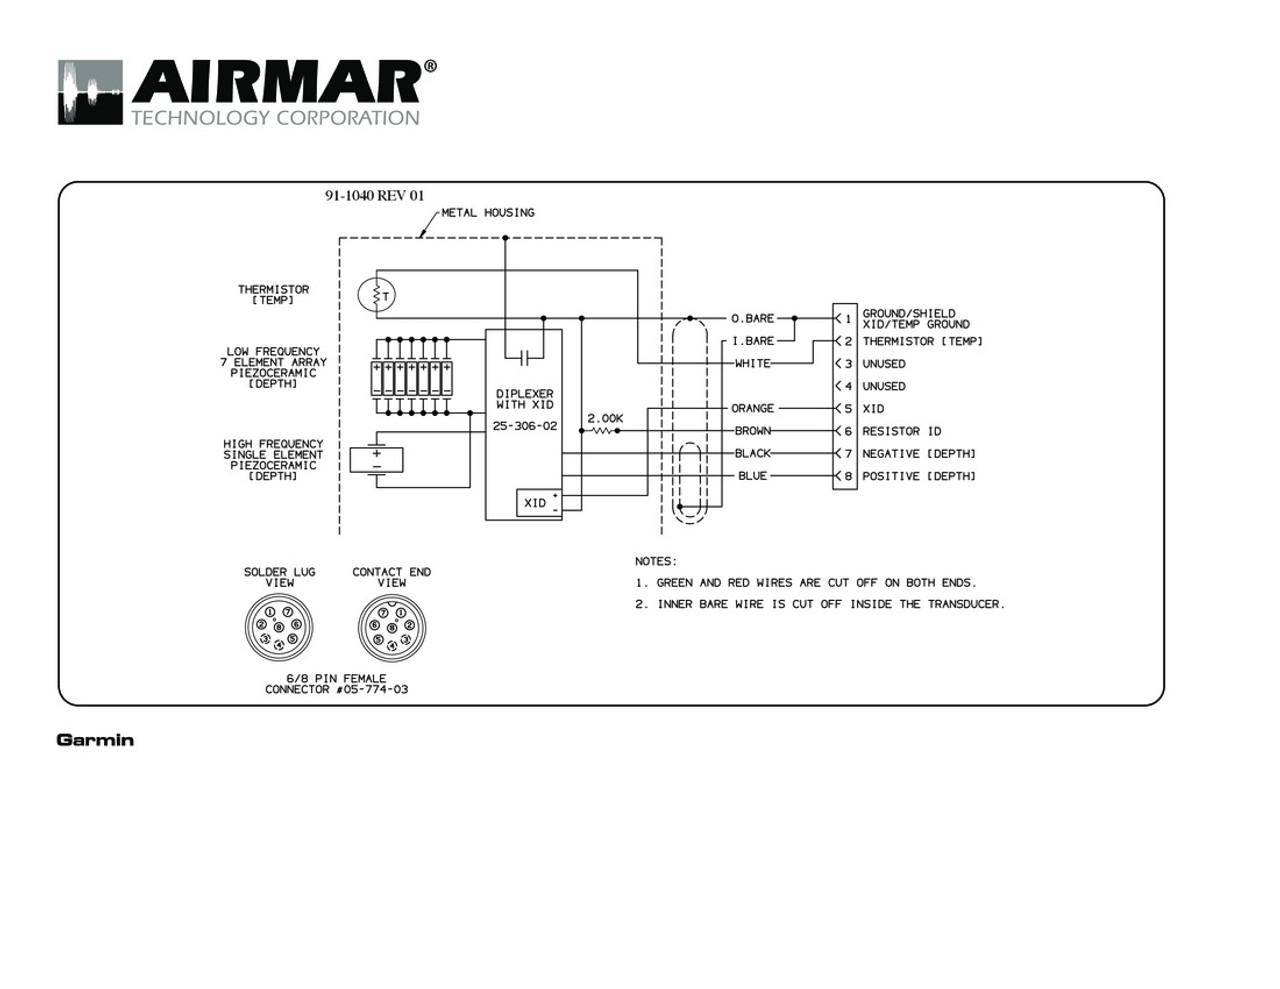 medium resolution of garmin 7 pin wiring diagram free wiring diagram for you u2022 rh evolvedlife store connector 8 pin relay wiring diagram 8 pin trailer connector wiring